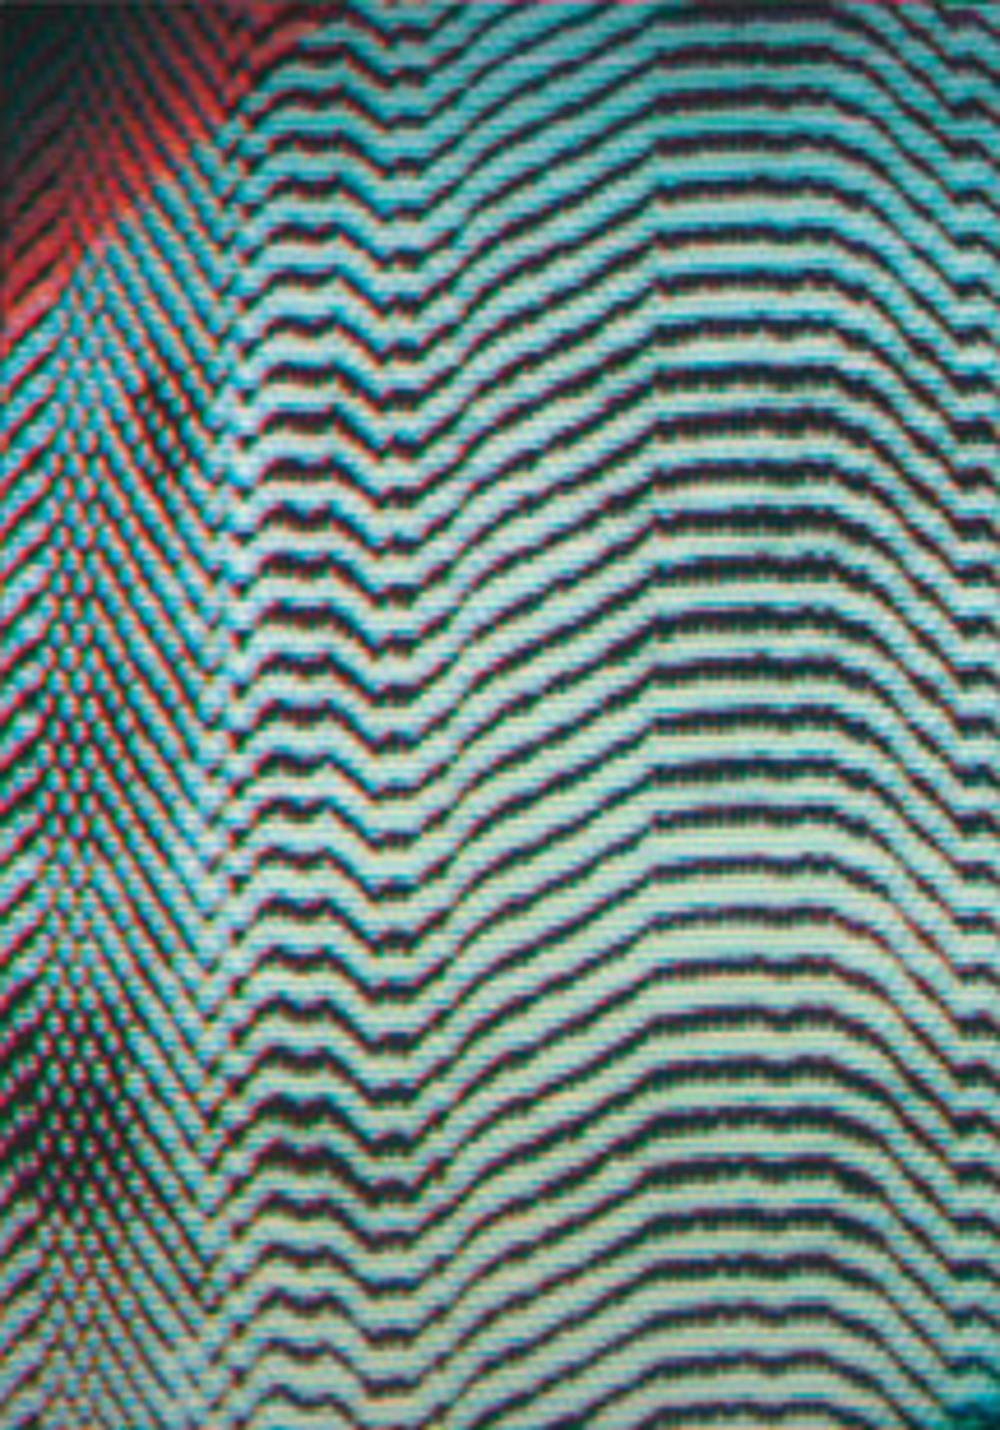 High Resolution Wallpaper | Static 1000x1430 px